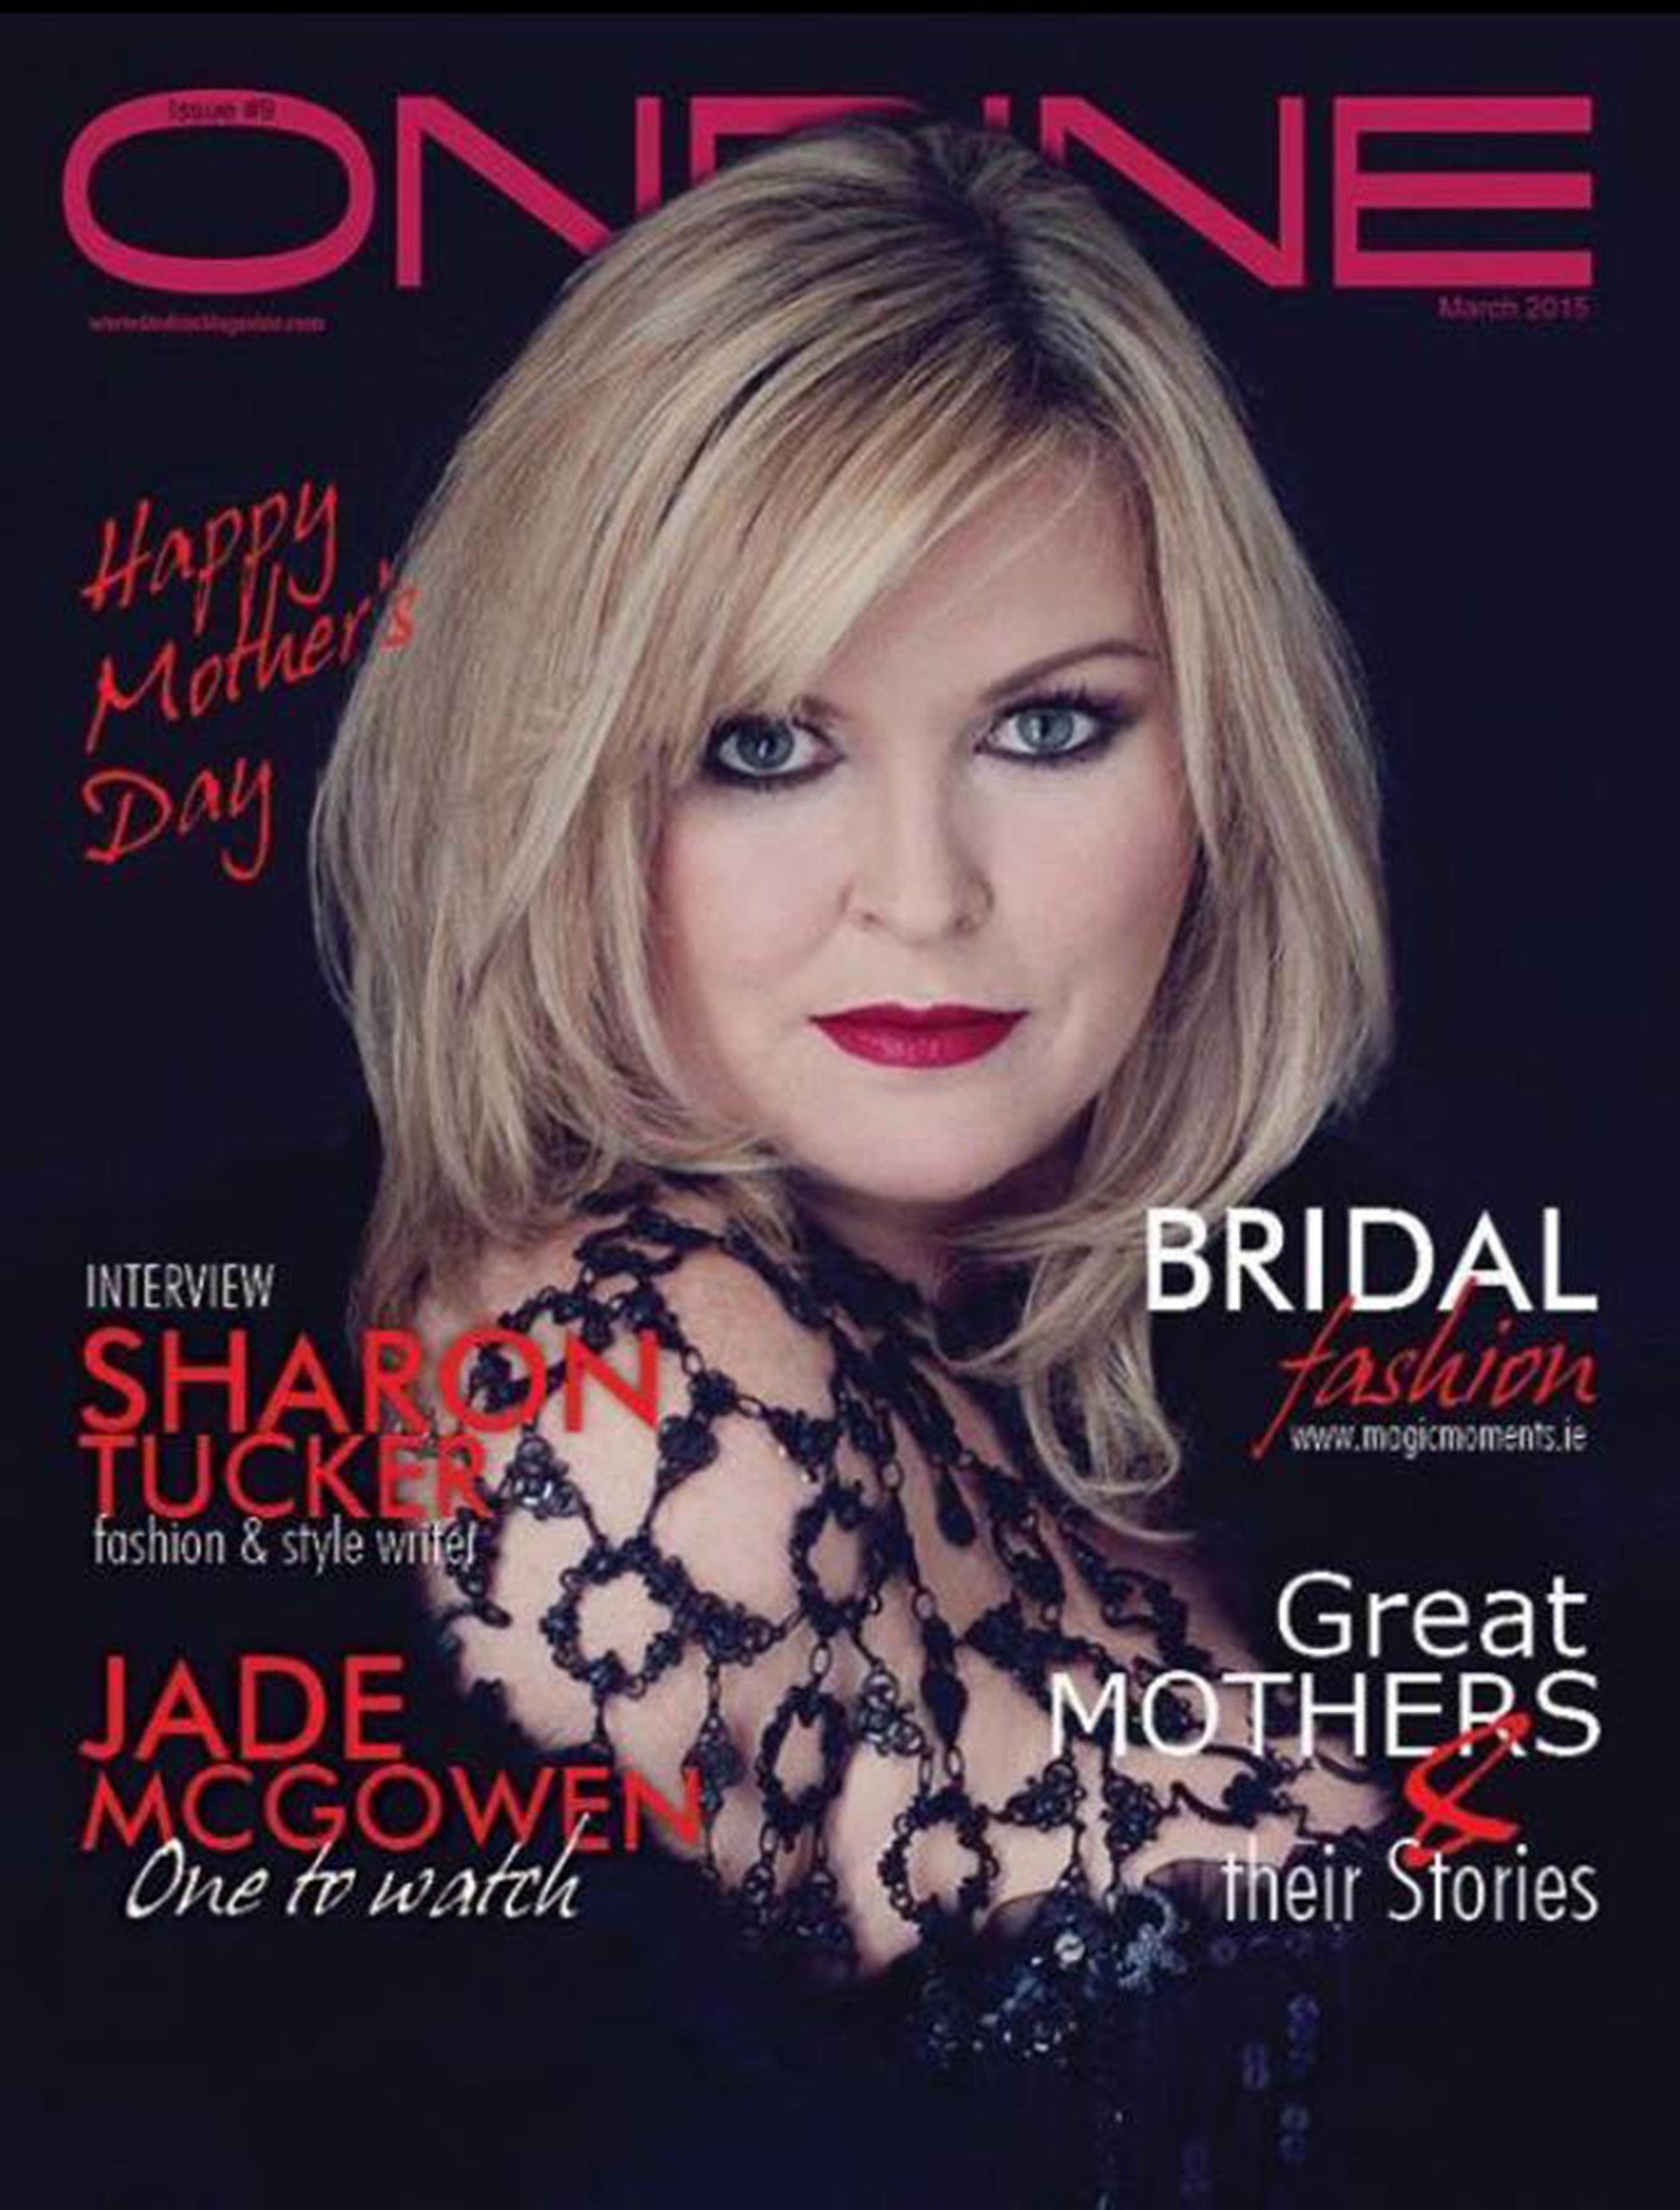 Ondine Magazine - Apr. 15